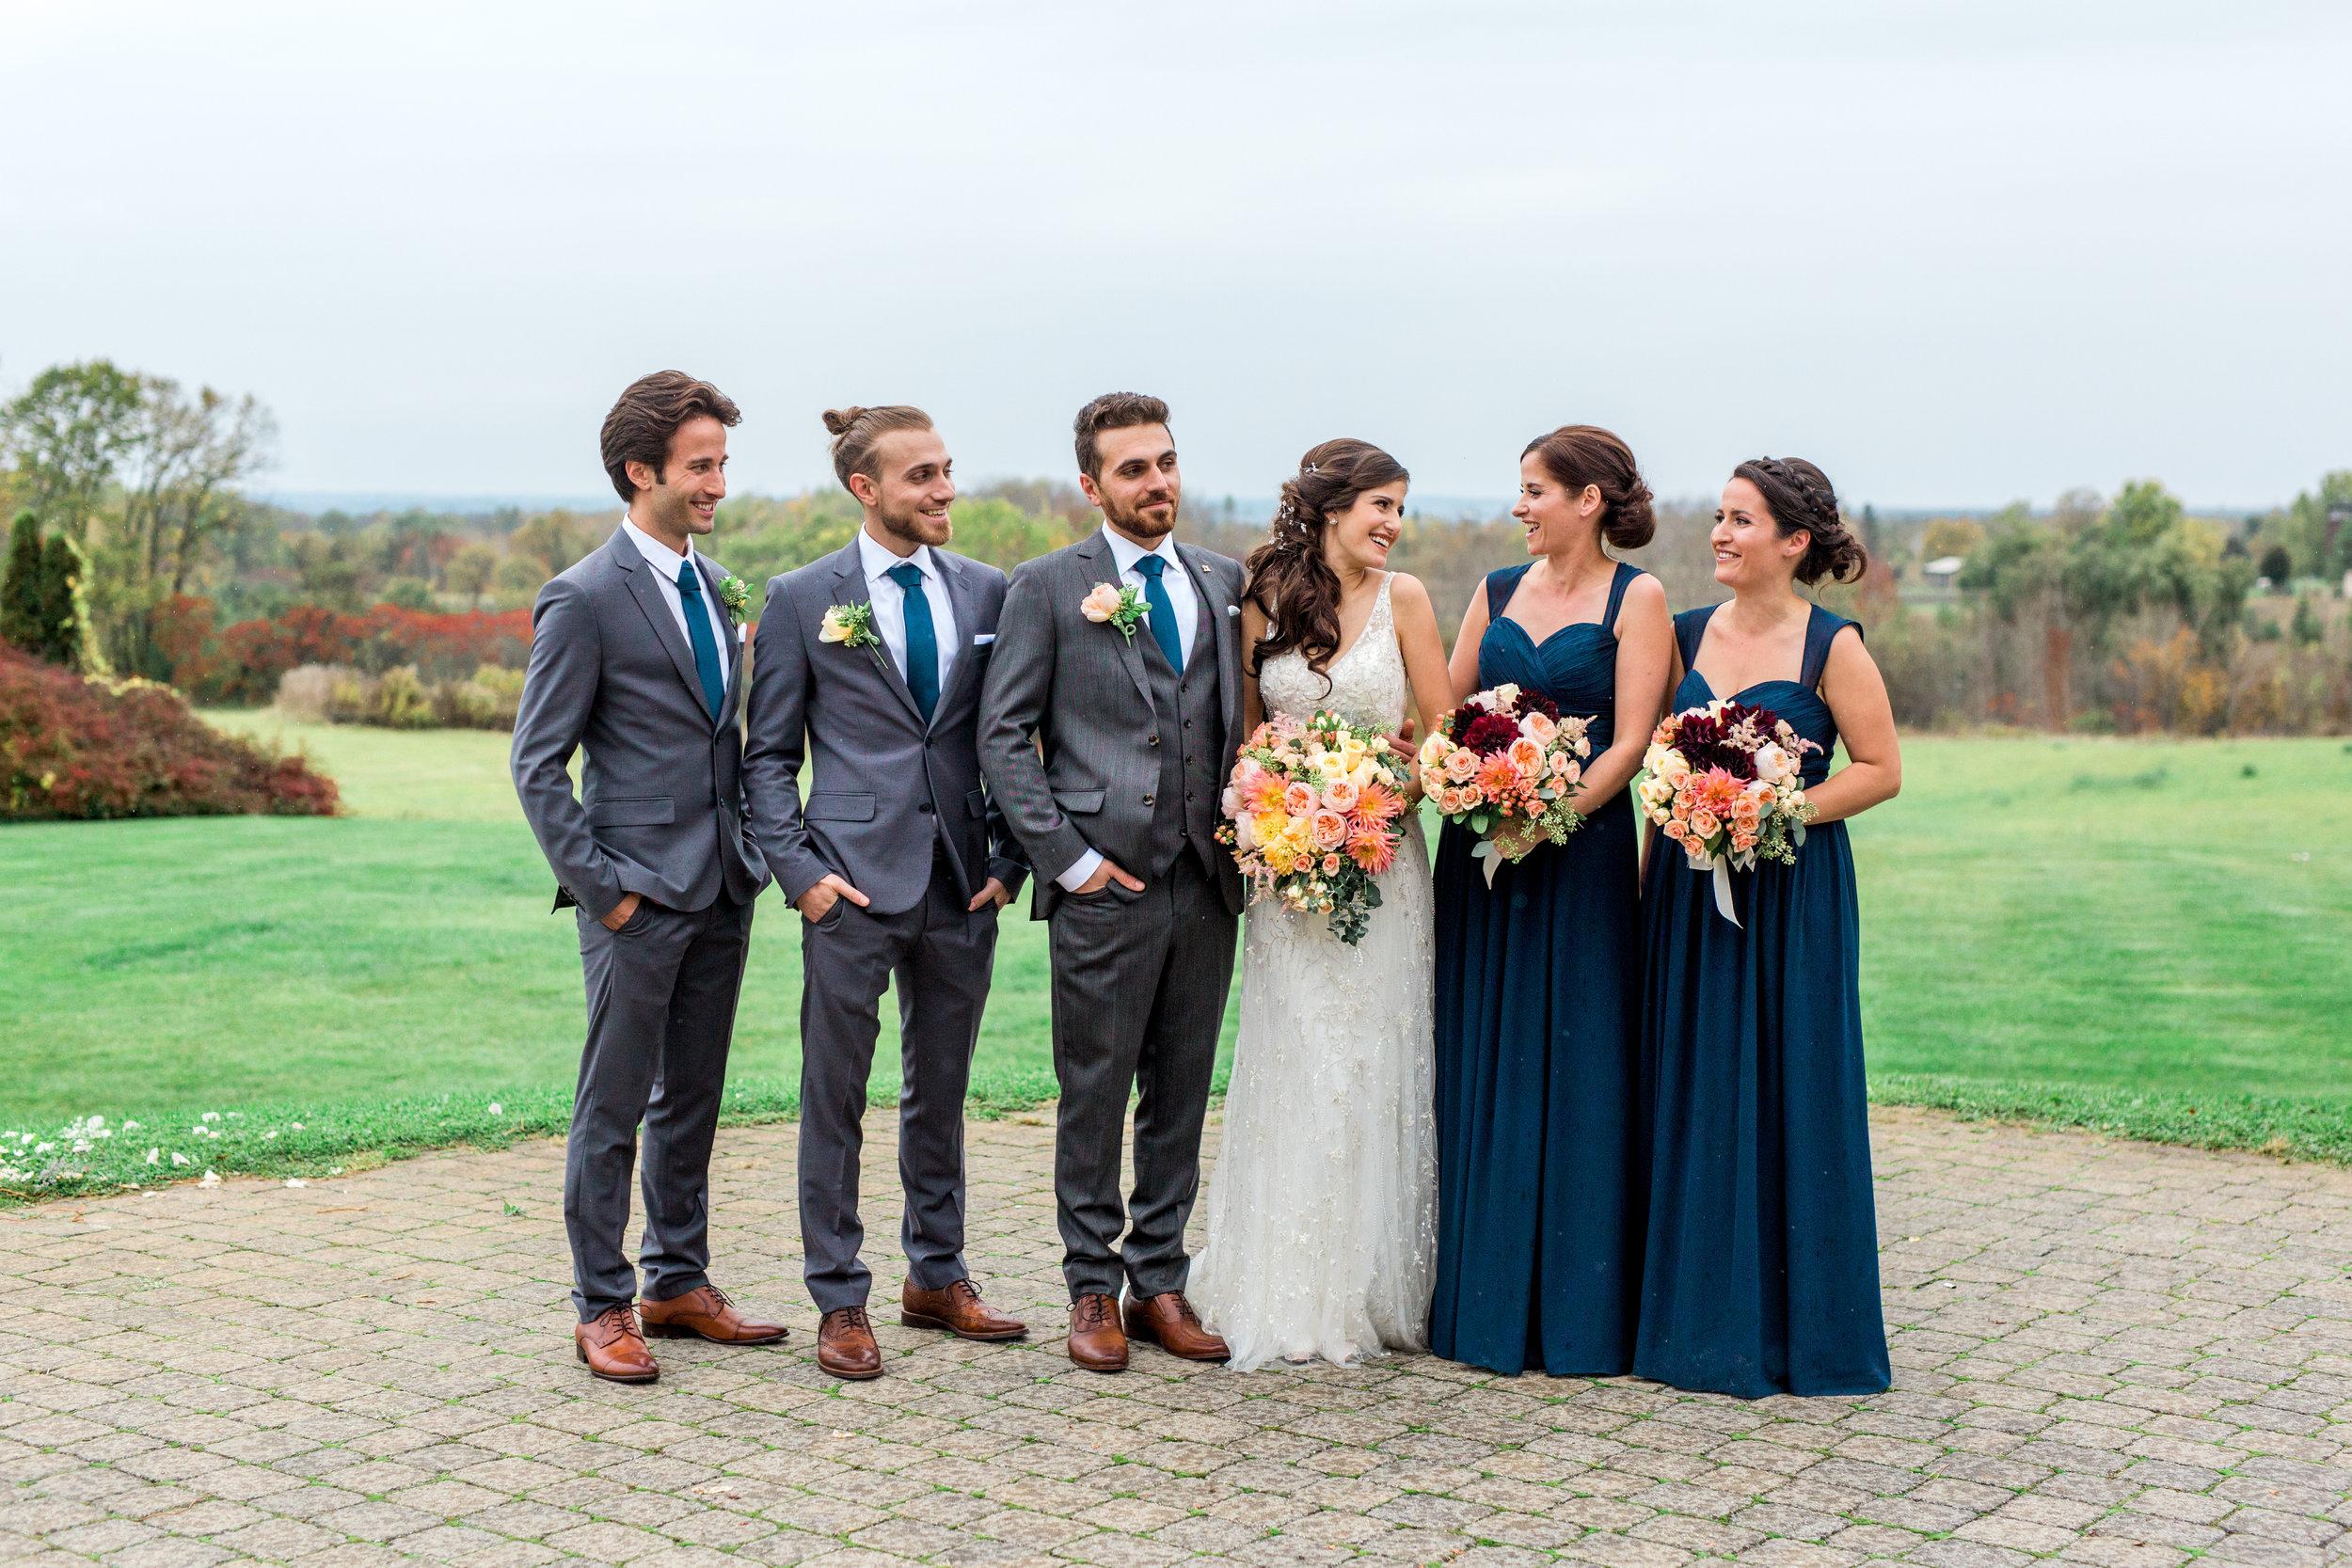 Amir-Golbazi-Danielle-Giroux-Photography_Toronto-Wedding_Cedarwood_Rachel-Paul_402.jpg